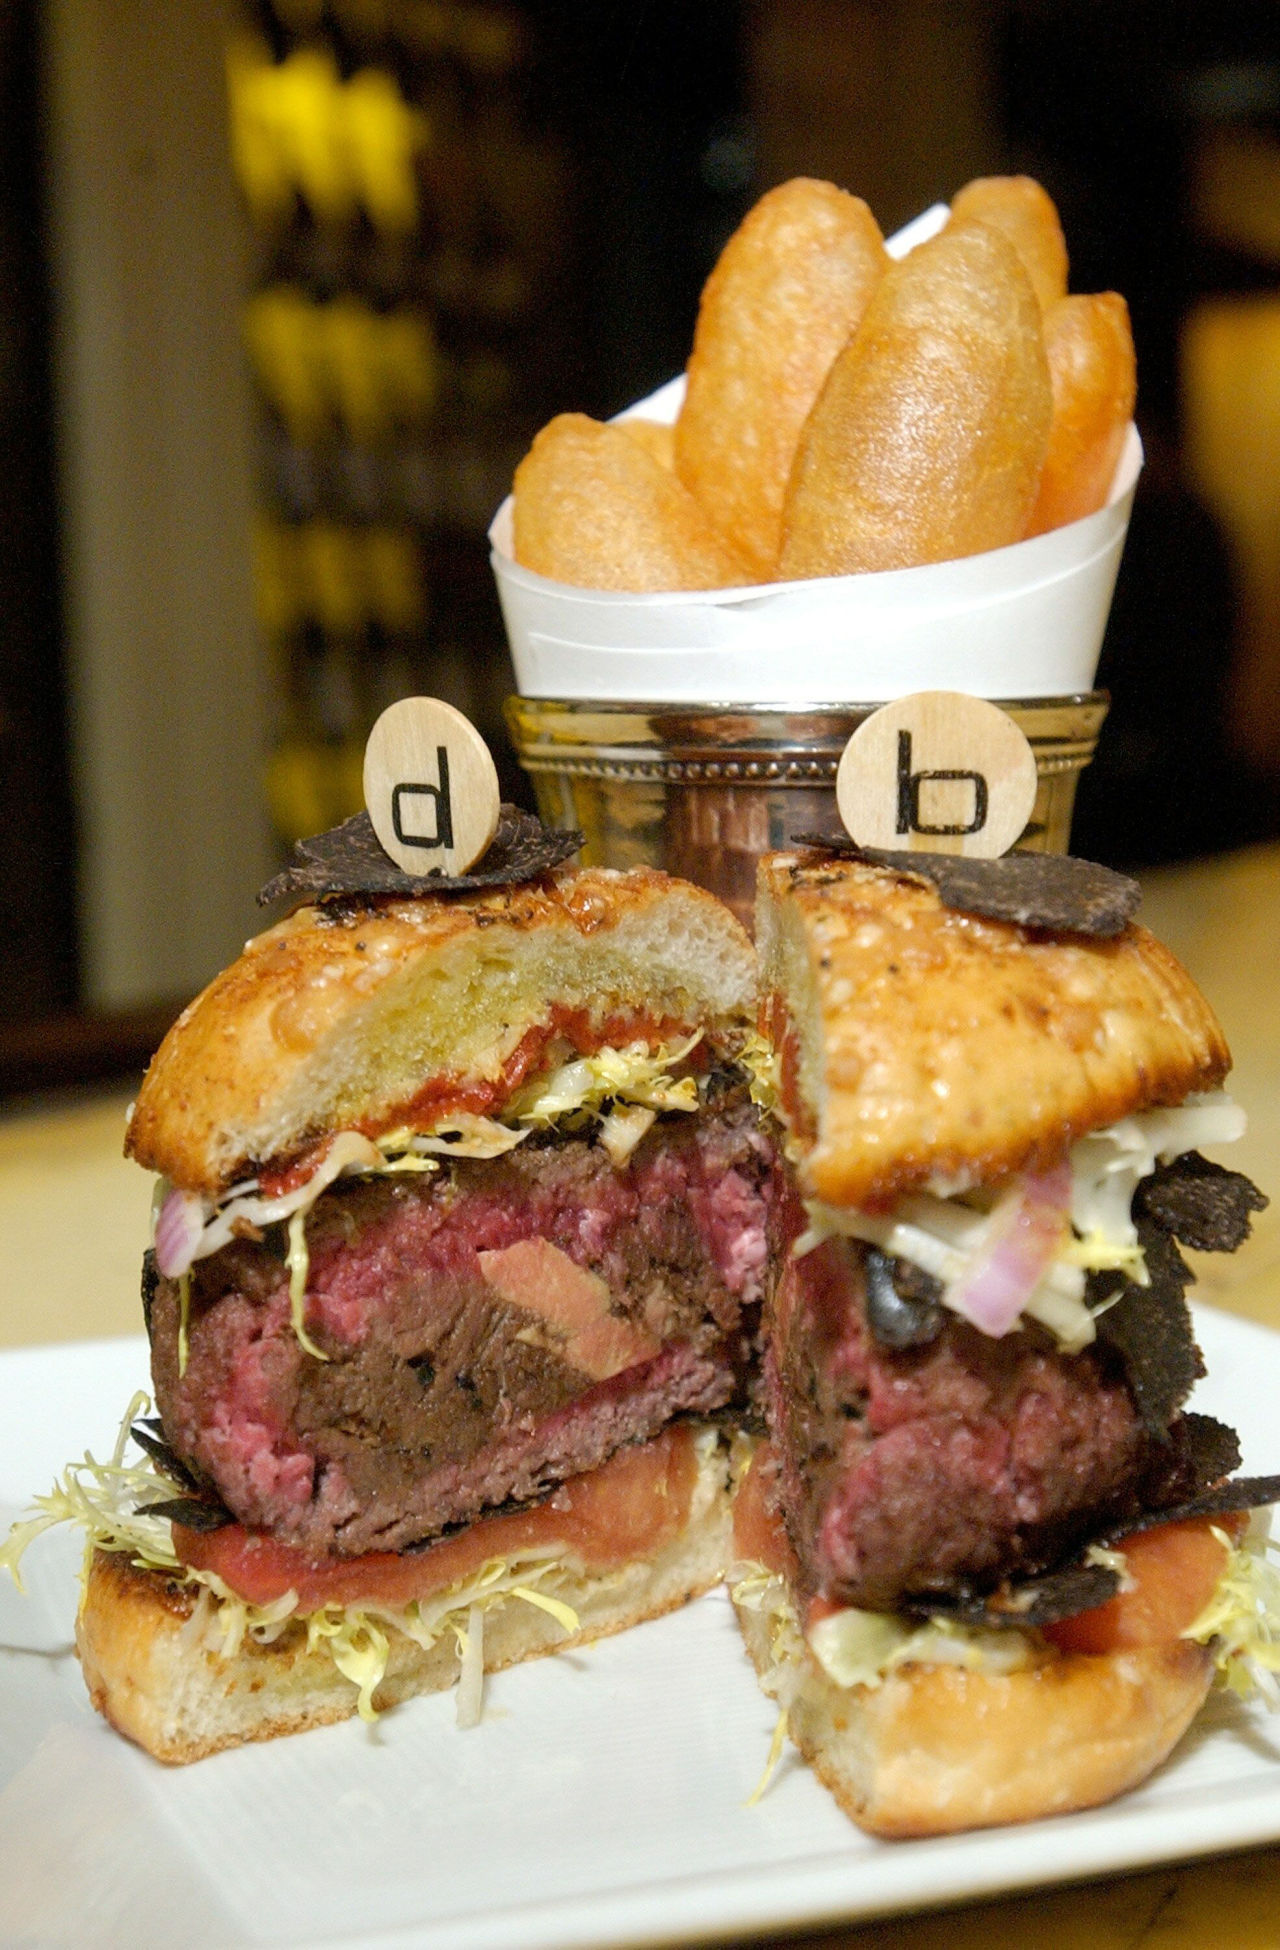 7. DB Royale Double Truffle Burger